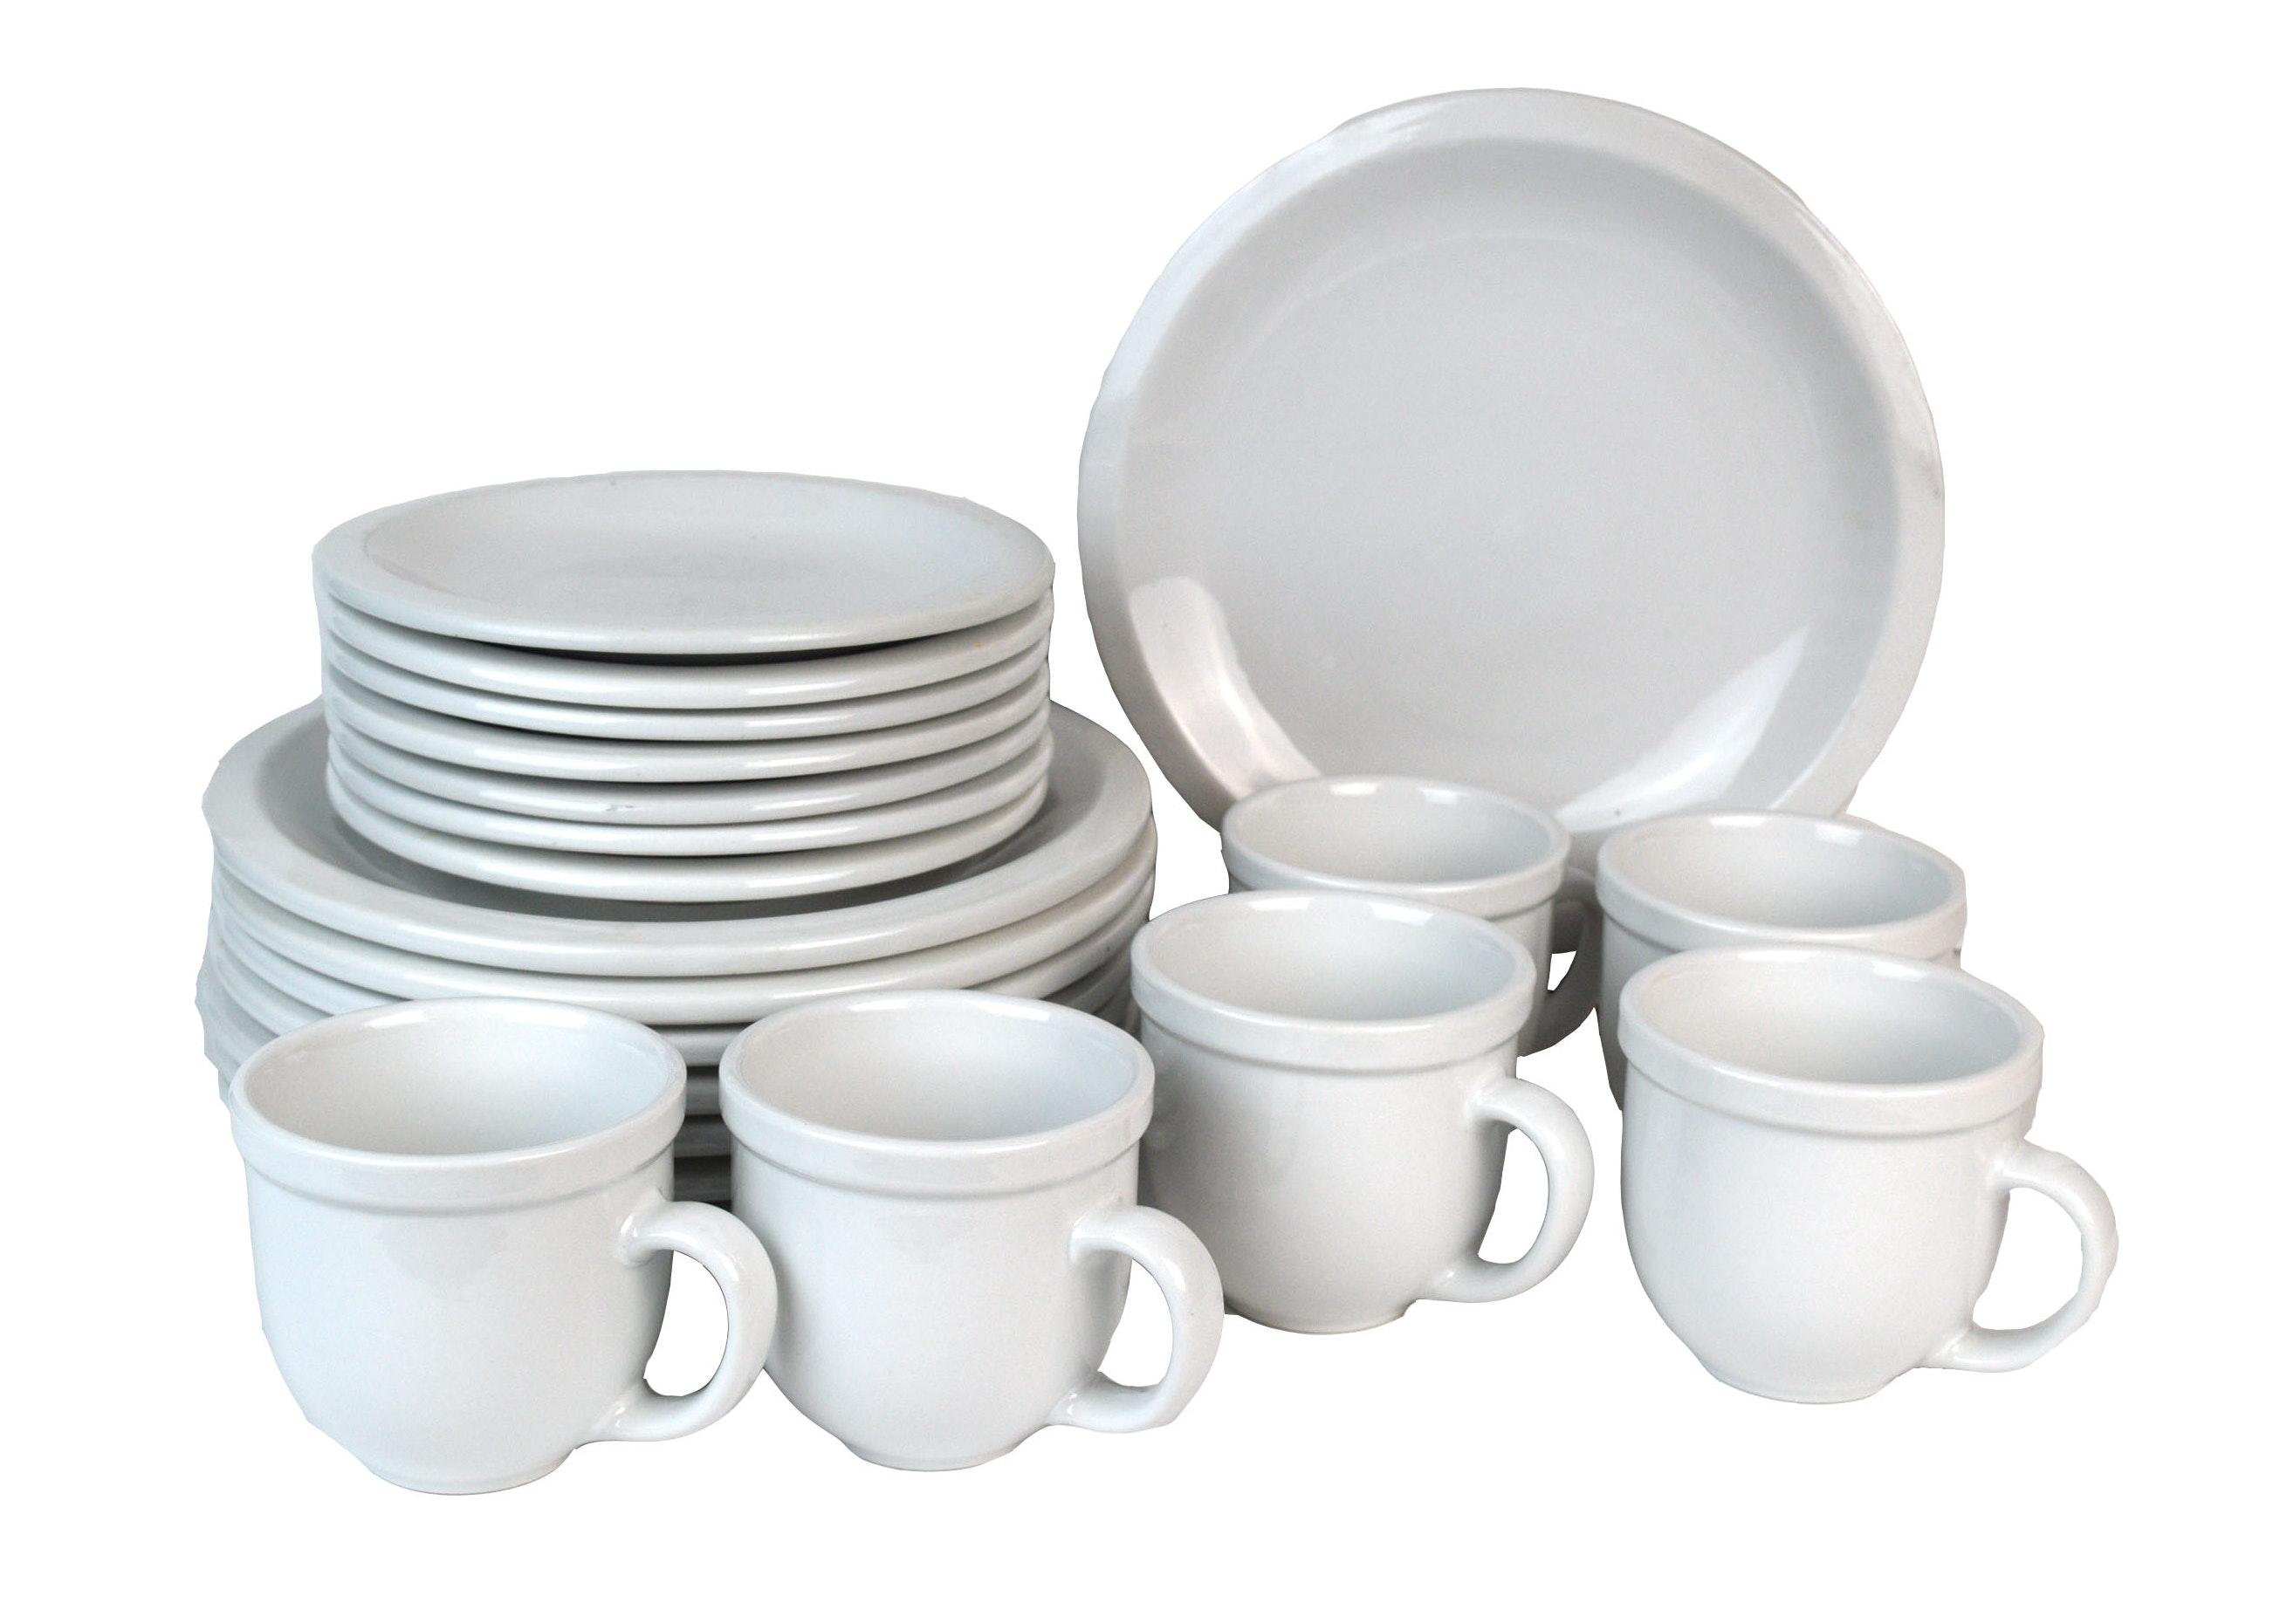 Cafeware by Tienshan Dinnerware ...  sc 1 st  EBTH.com & Cafeware by Tienshan Dinnerware : EBTH